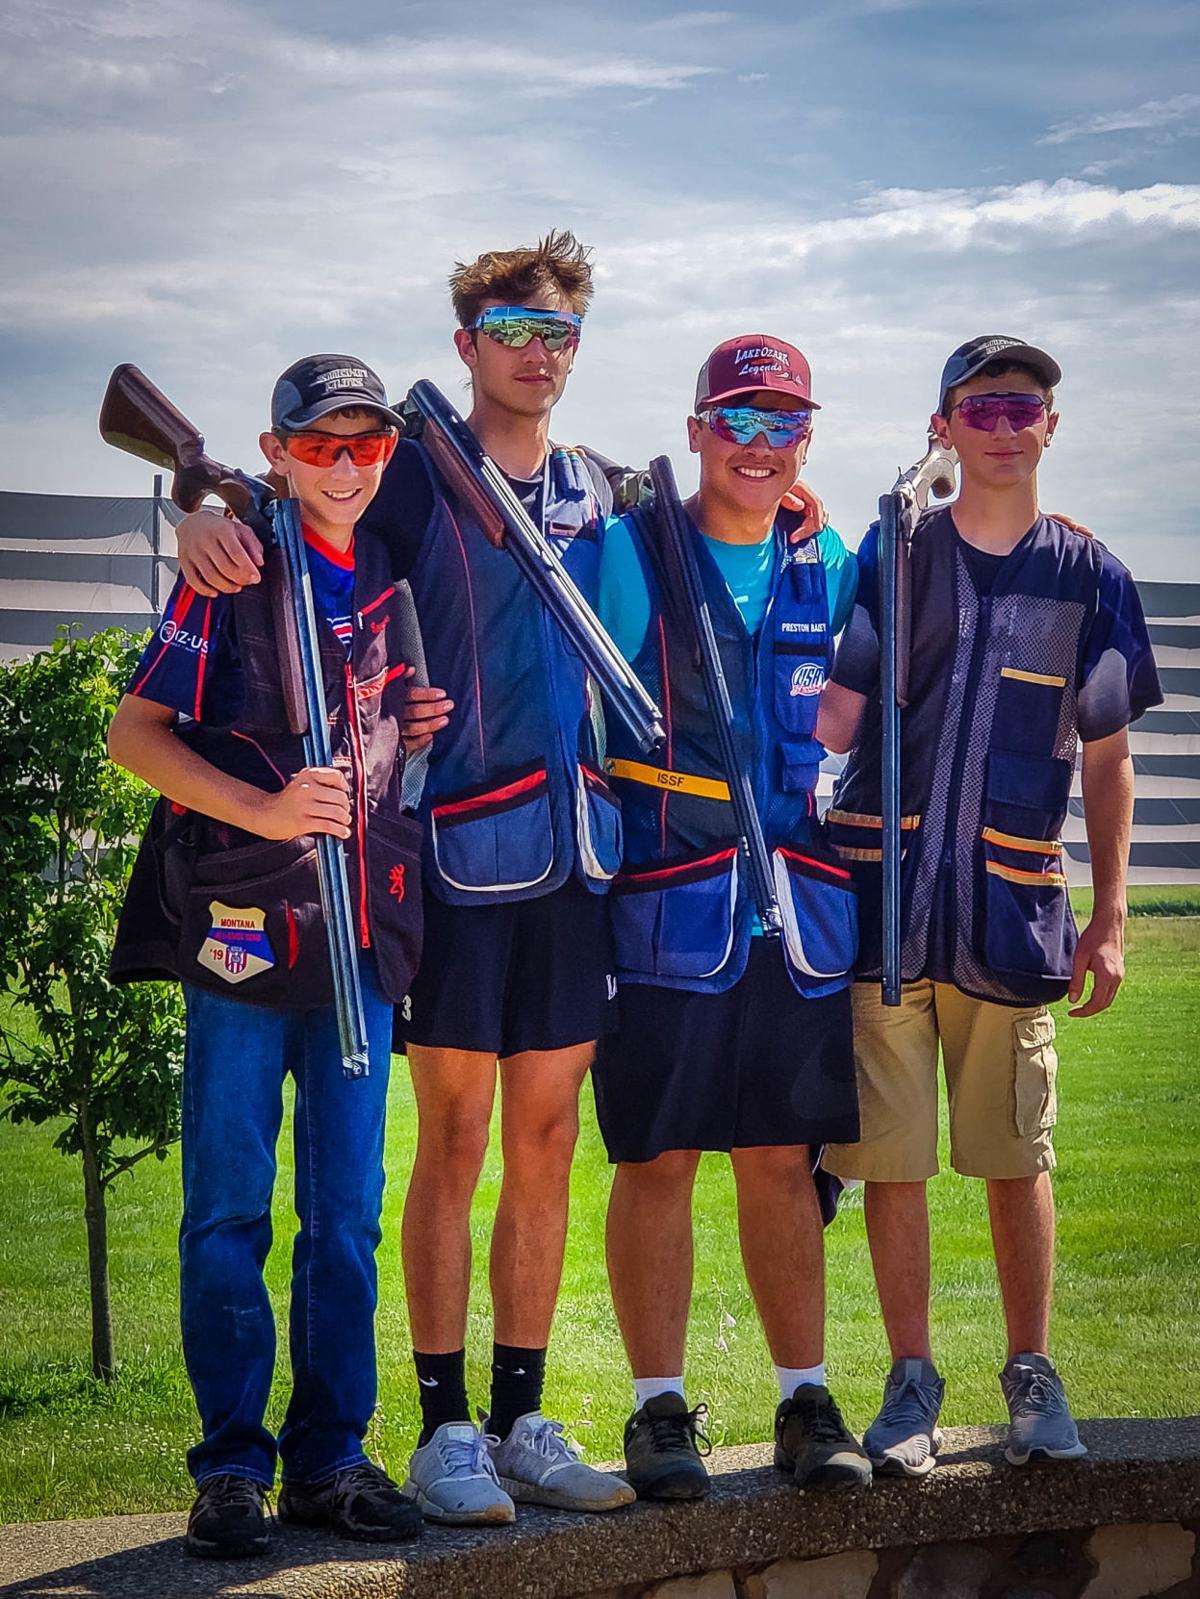 Austin Ward and Smokin Guns team